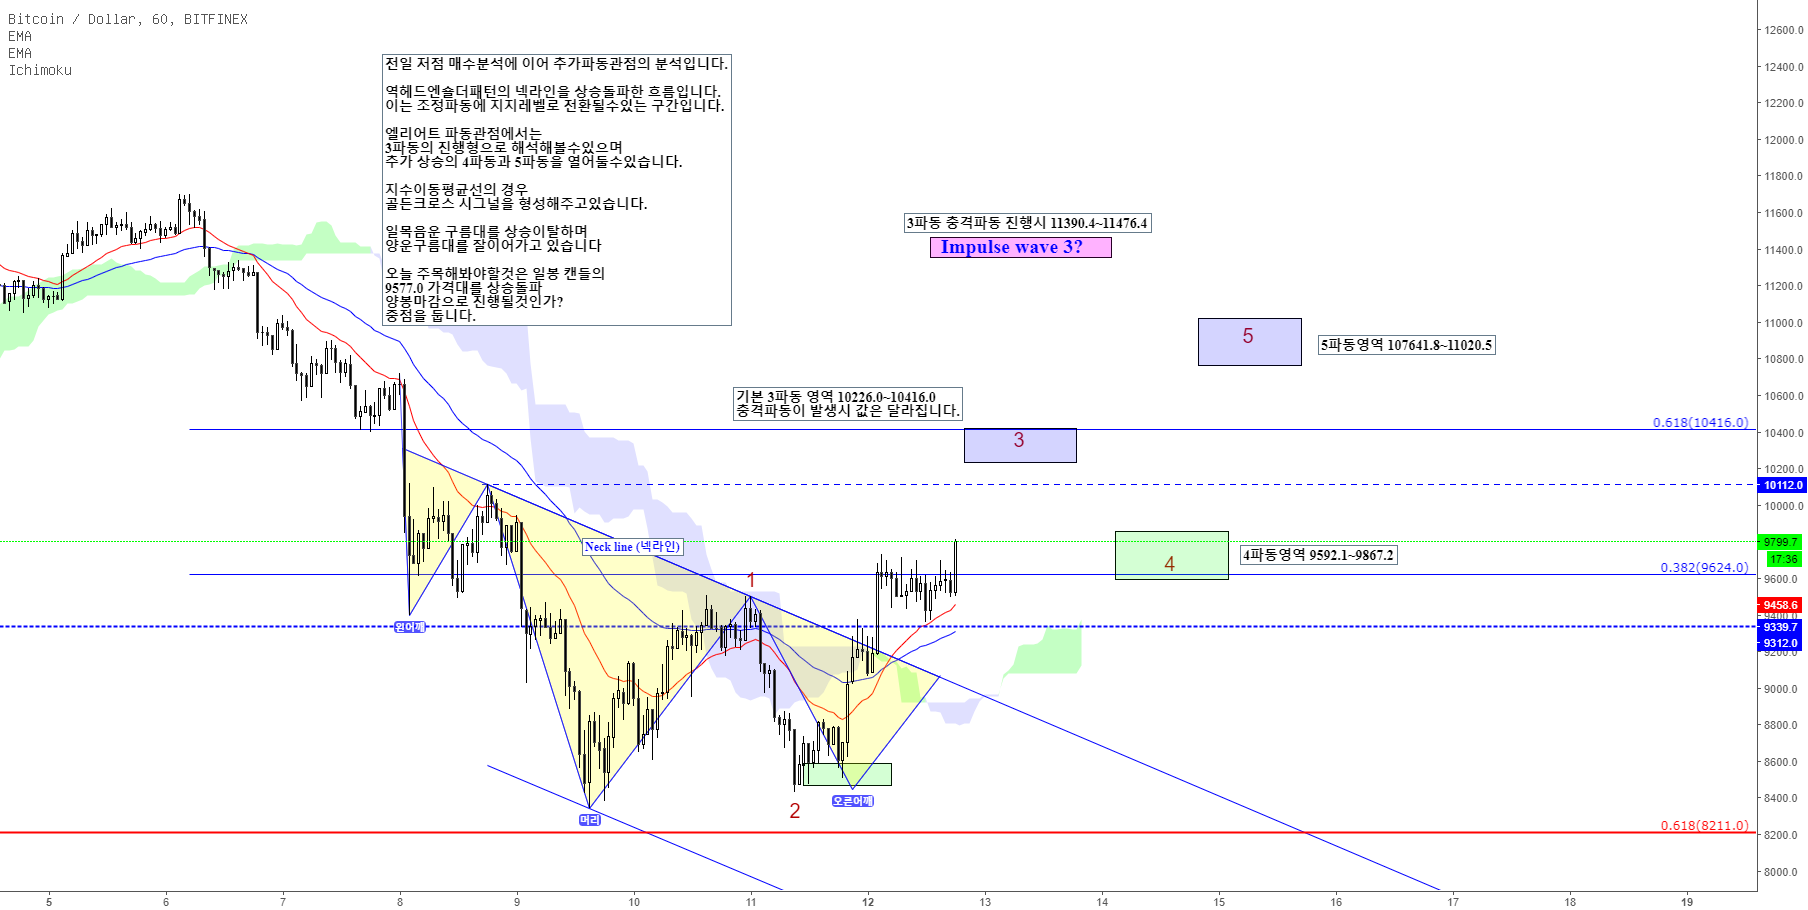 BTCUSD/ Bitcoin /비트코인 일봉 패턴지지매물대 상승 (엘리엇파동)Elliott Wave Cycle 적용